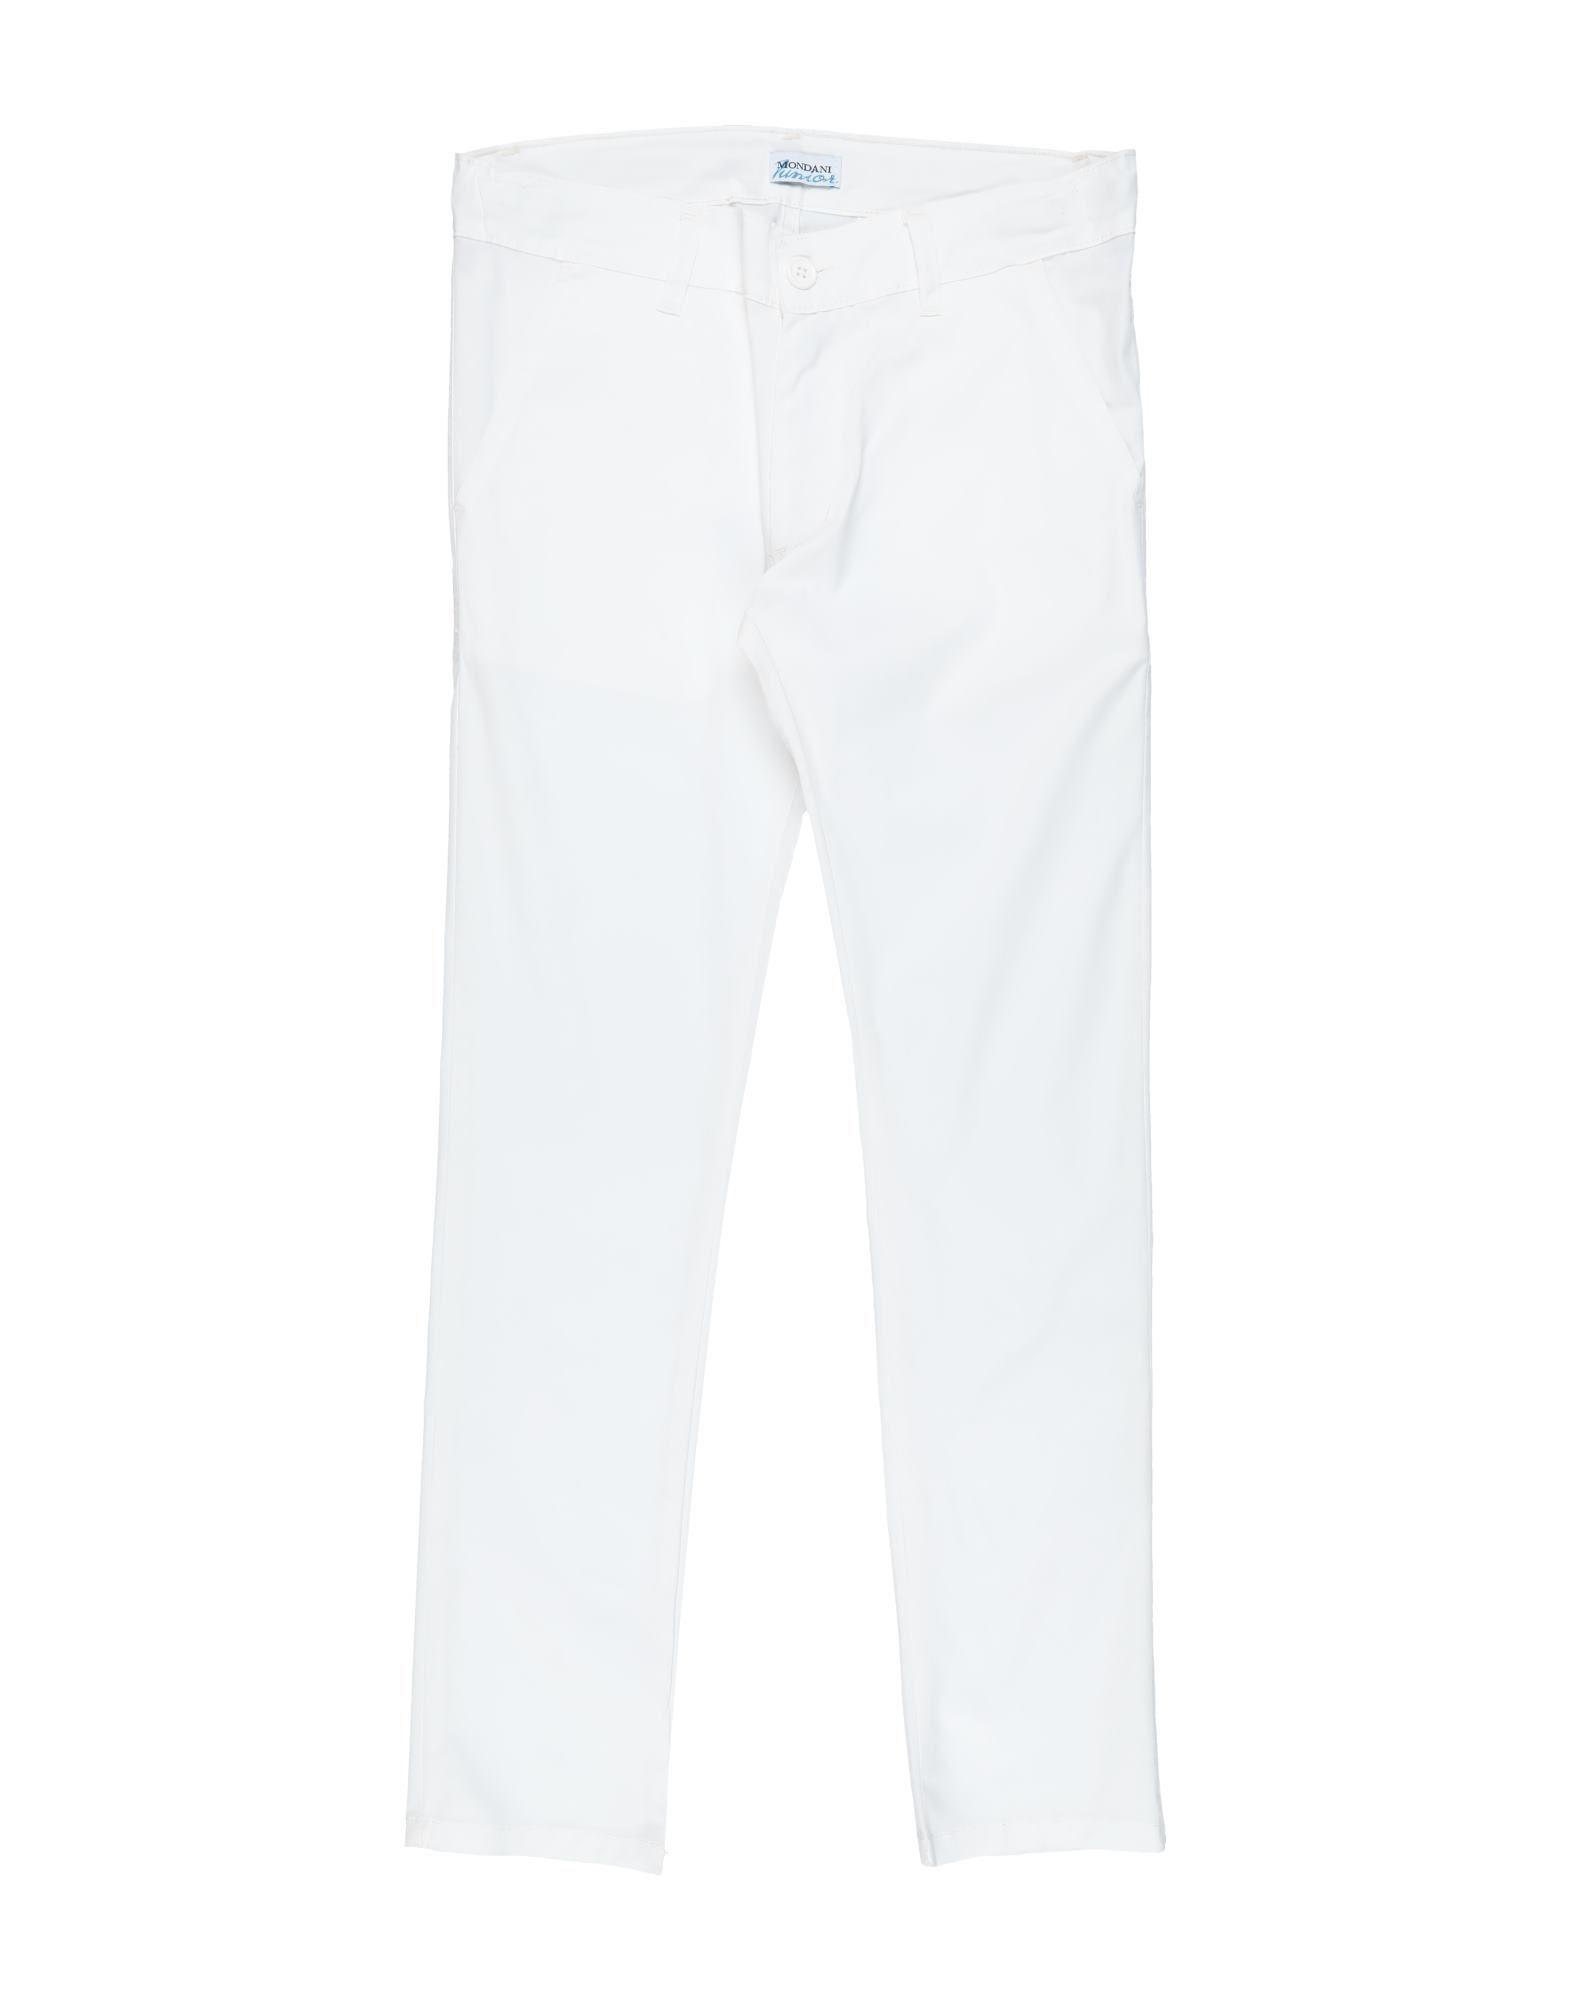 Mondani Junior Kids' Casual Pants In White